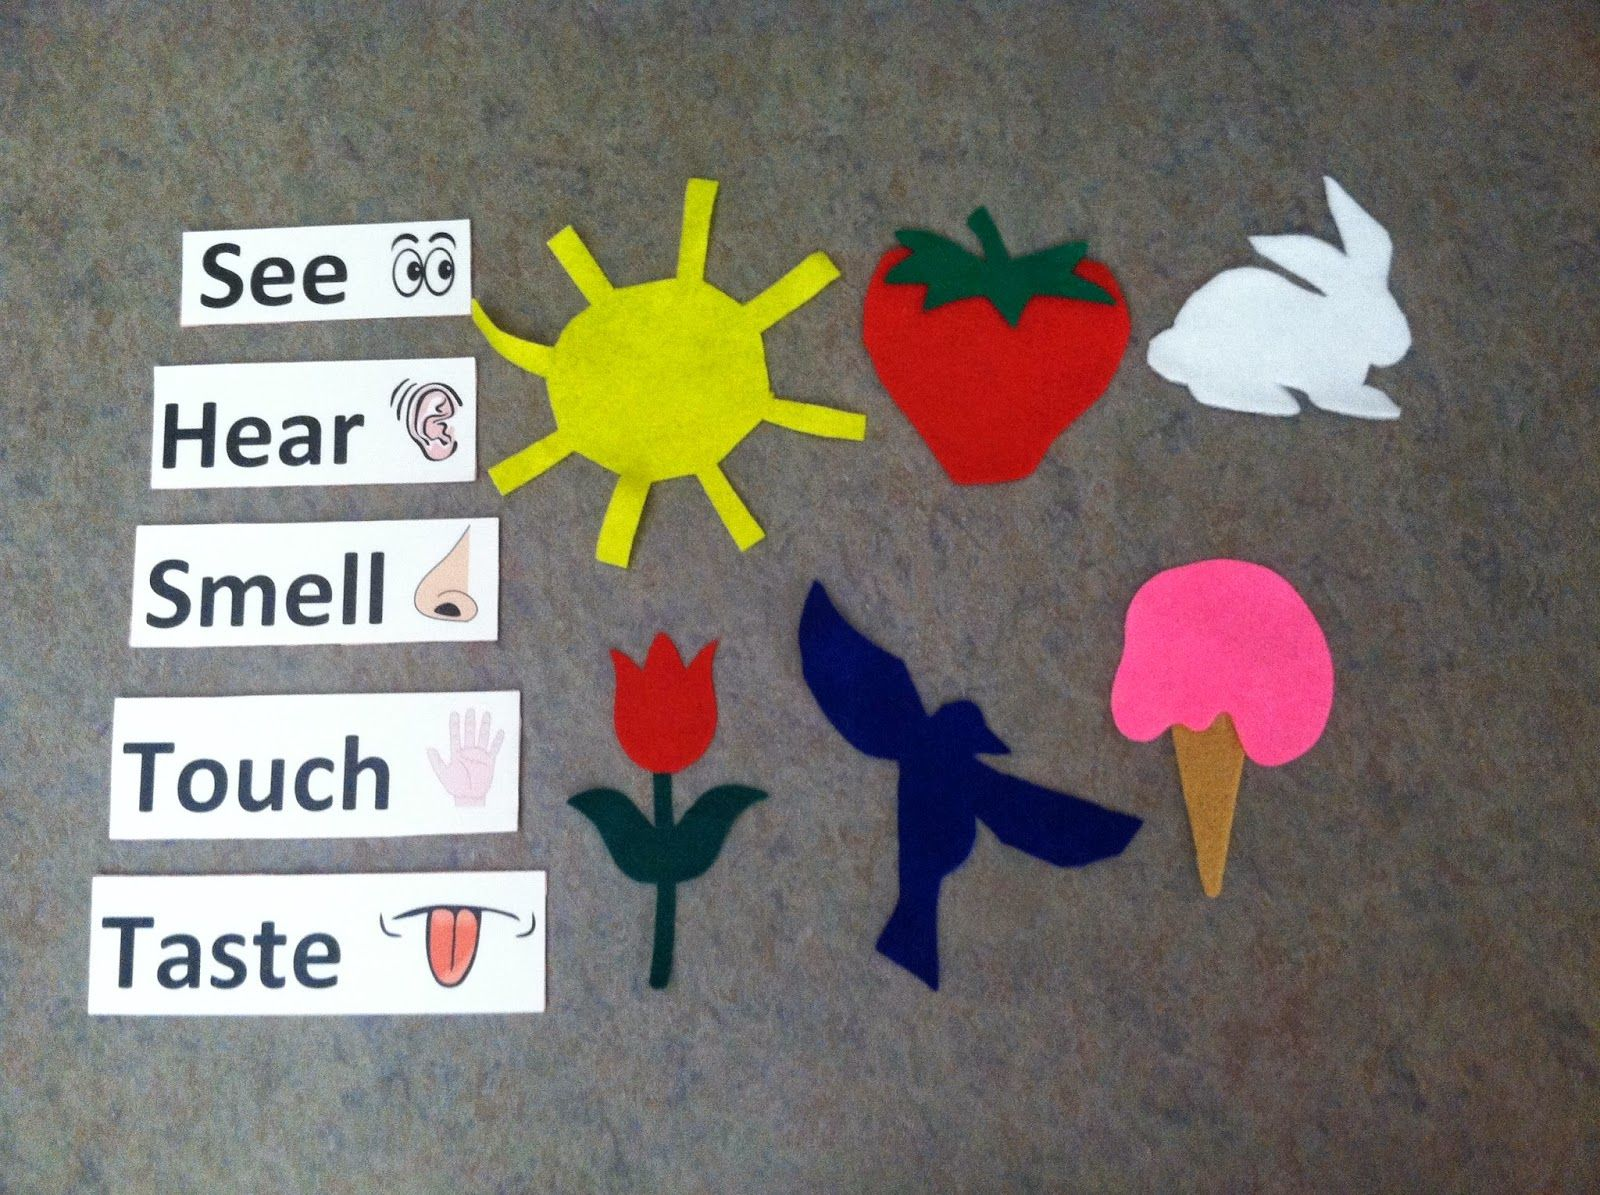 Library Storytime 5 Senses Books Songs Flannelboard Senses Stations